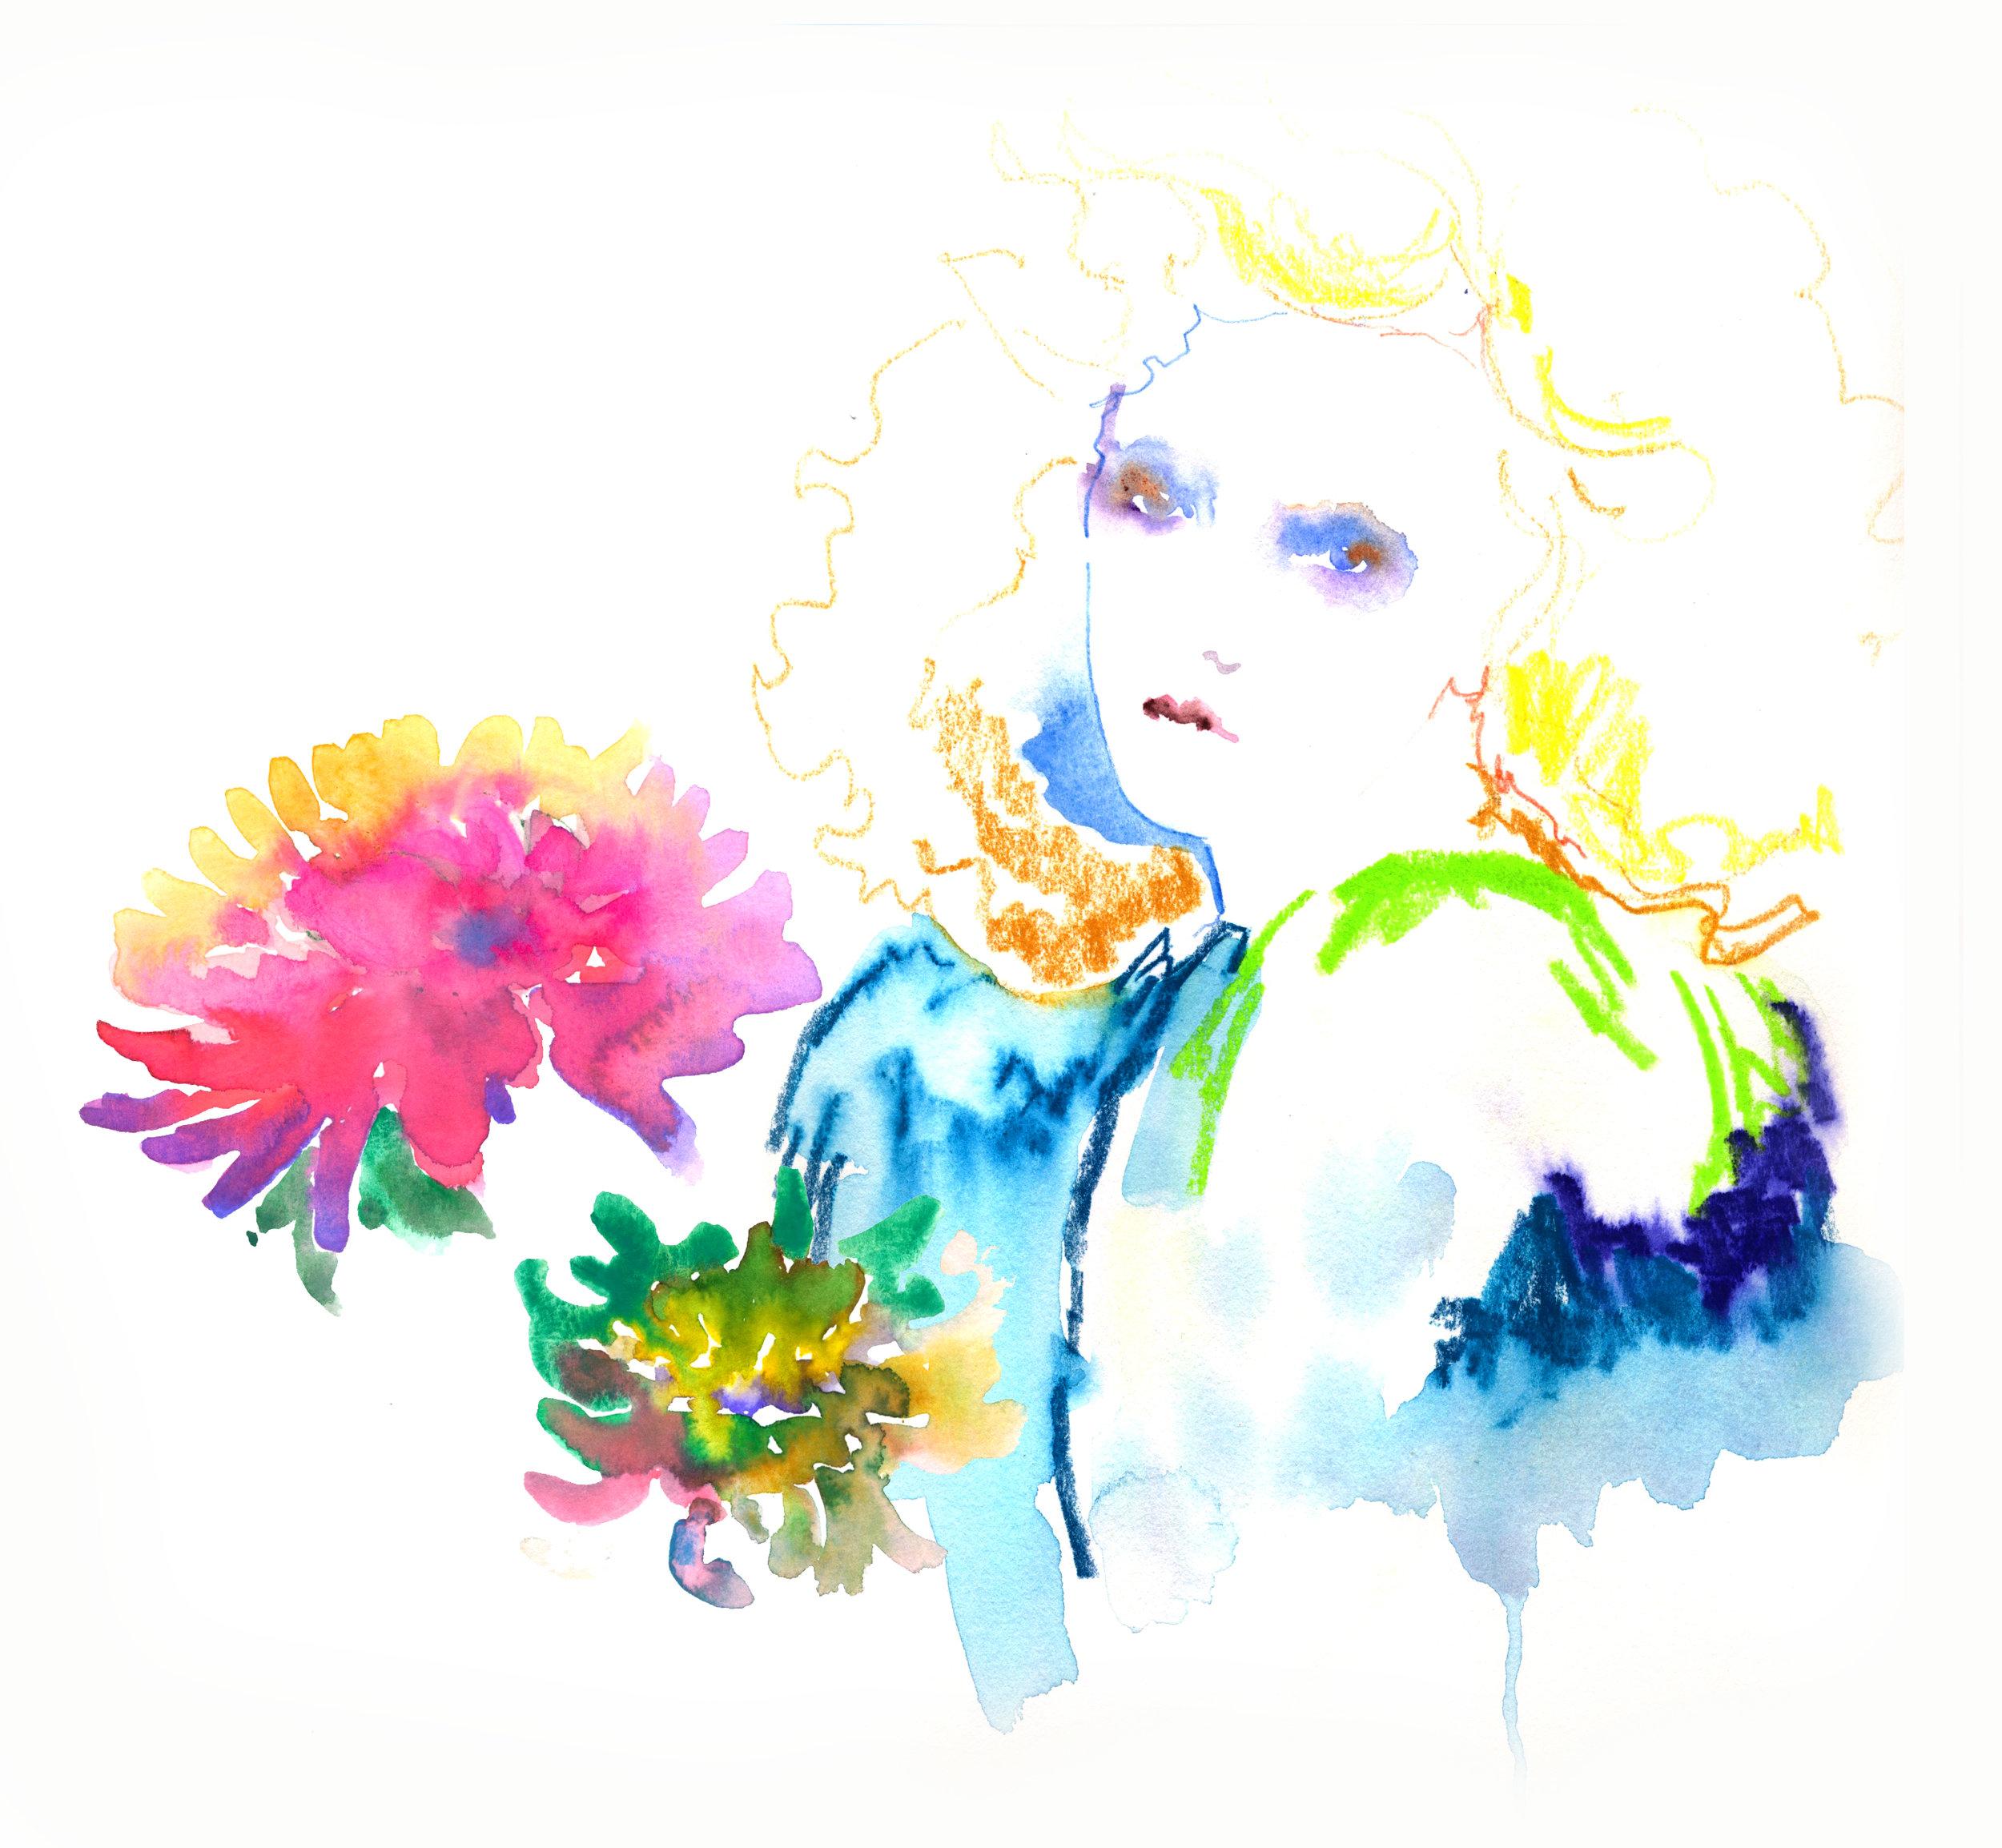 Colour Pencil and Watercolour wash